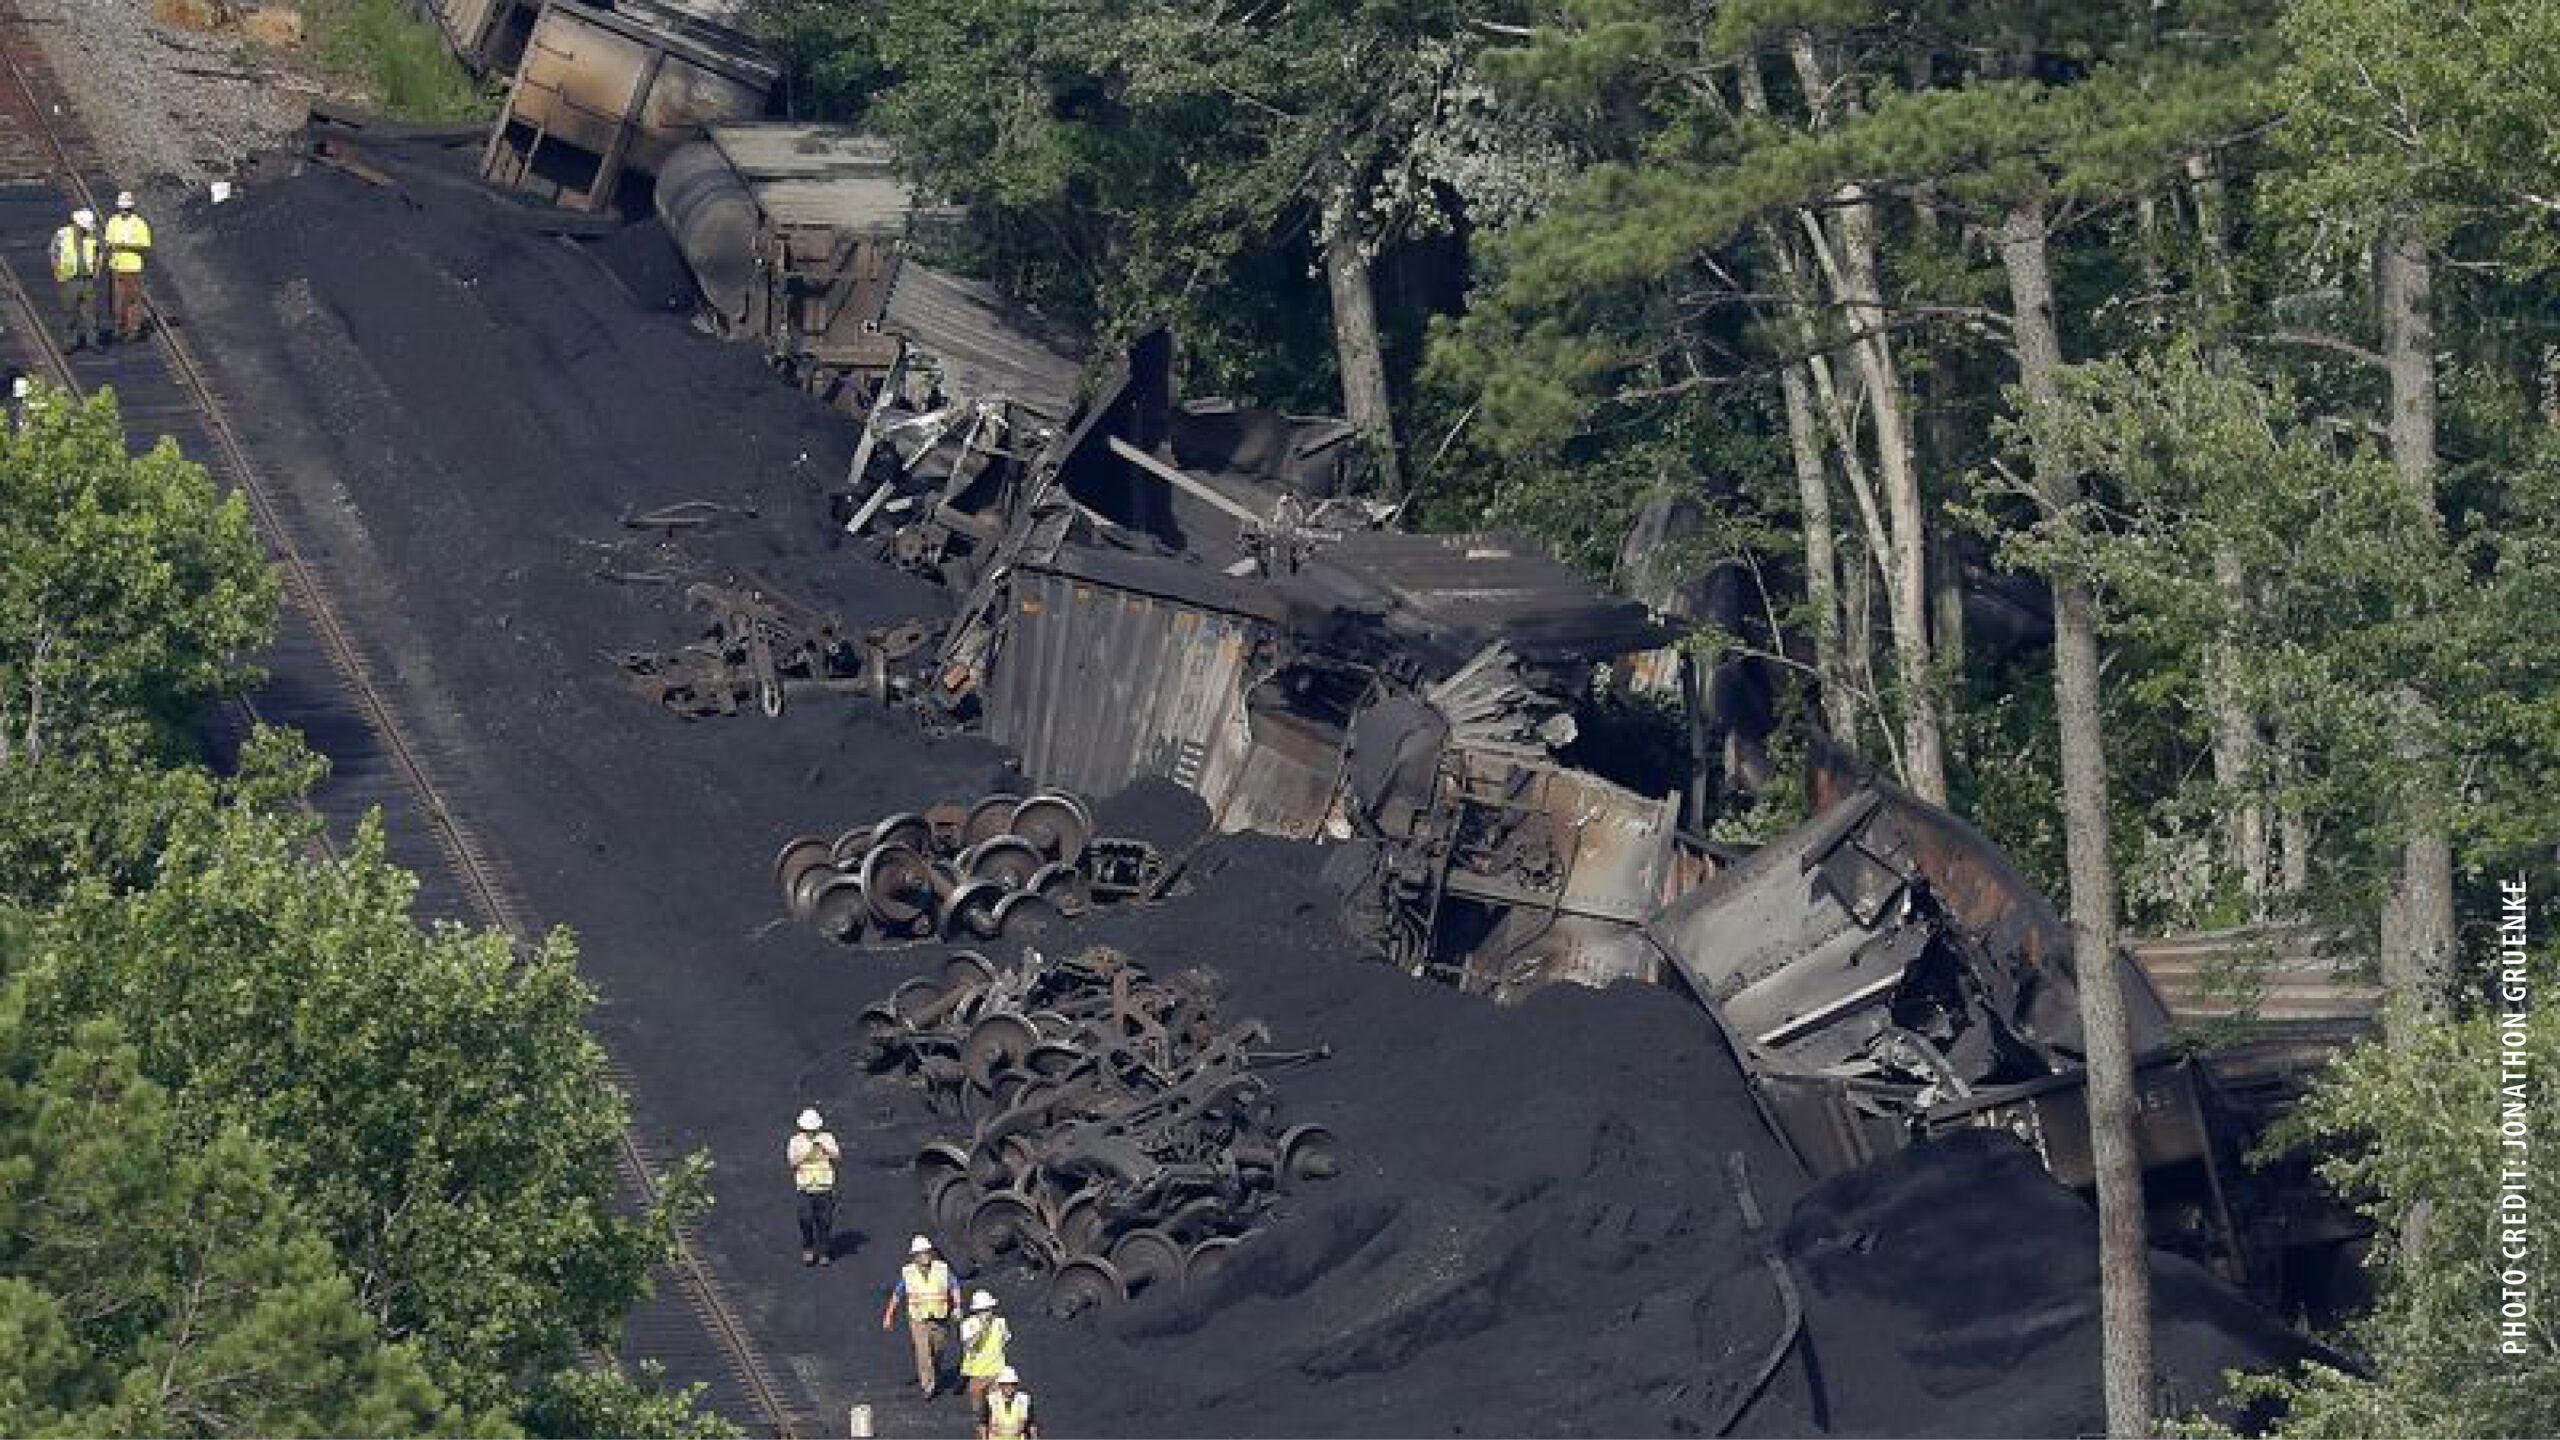 Coal Train Derailed